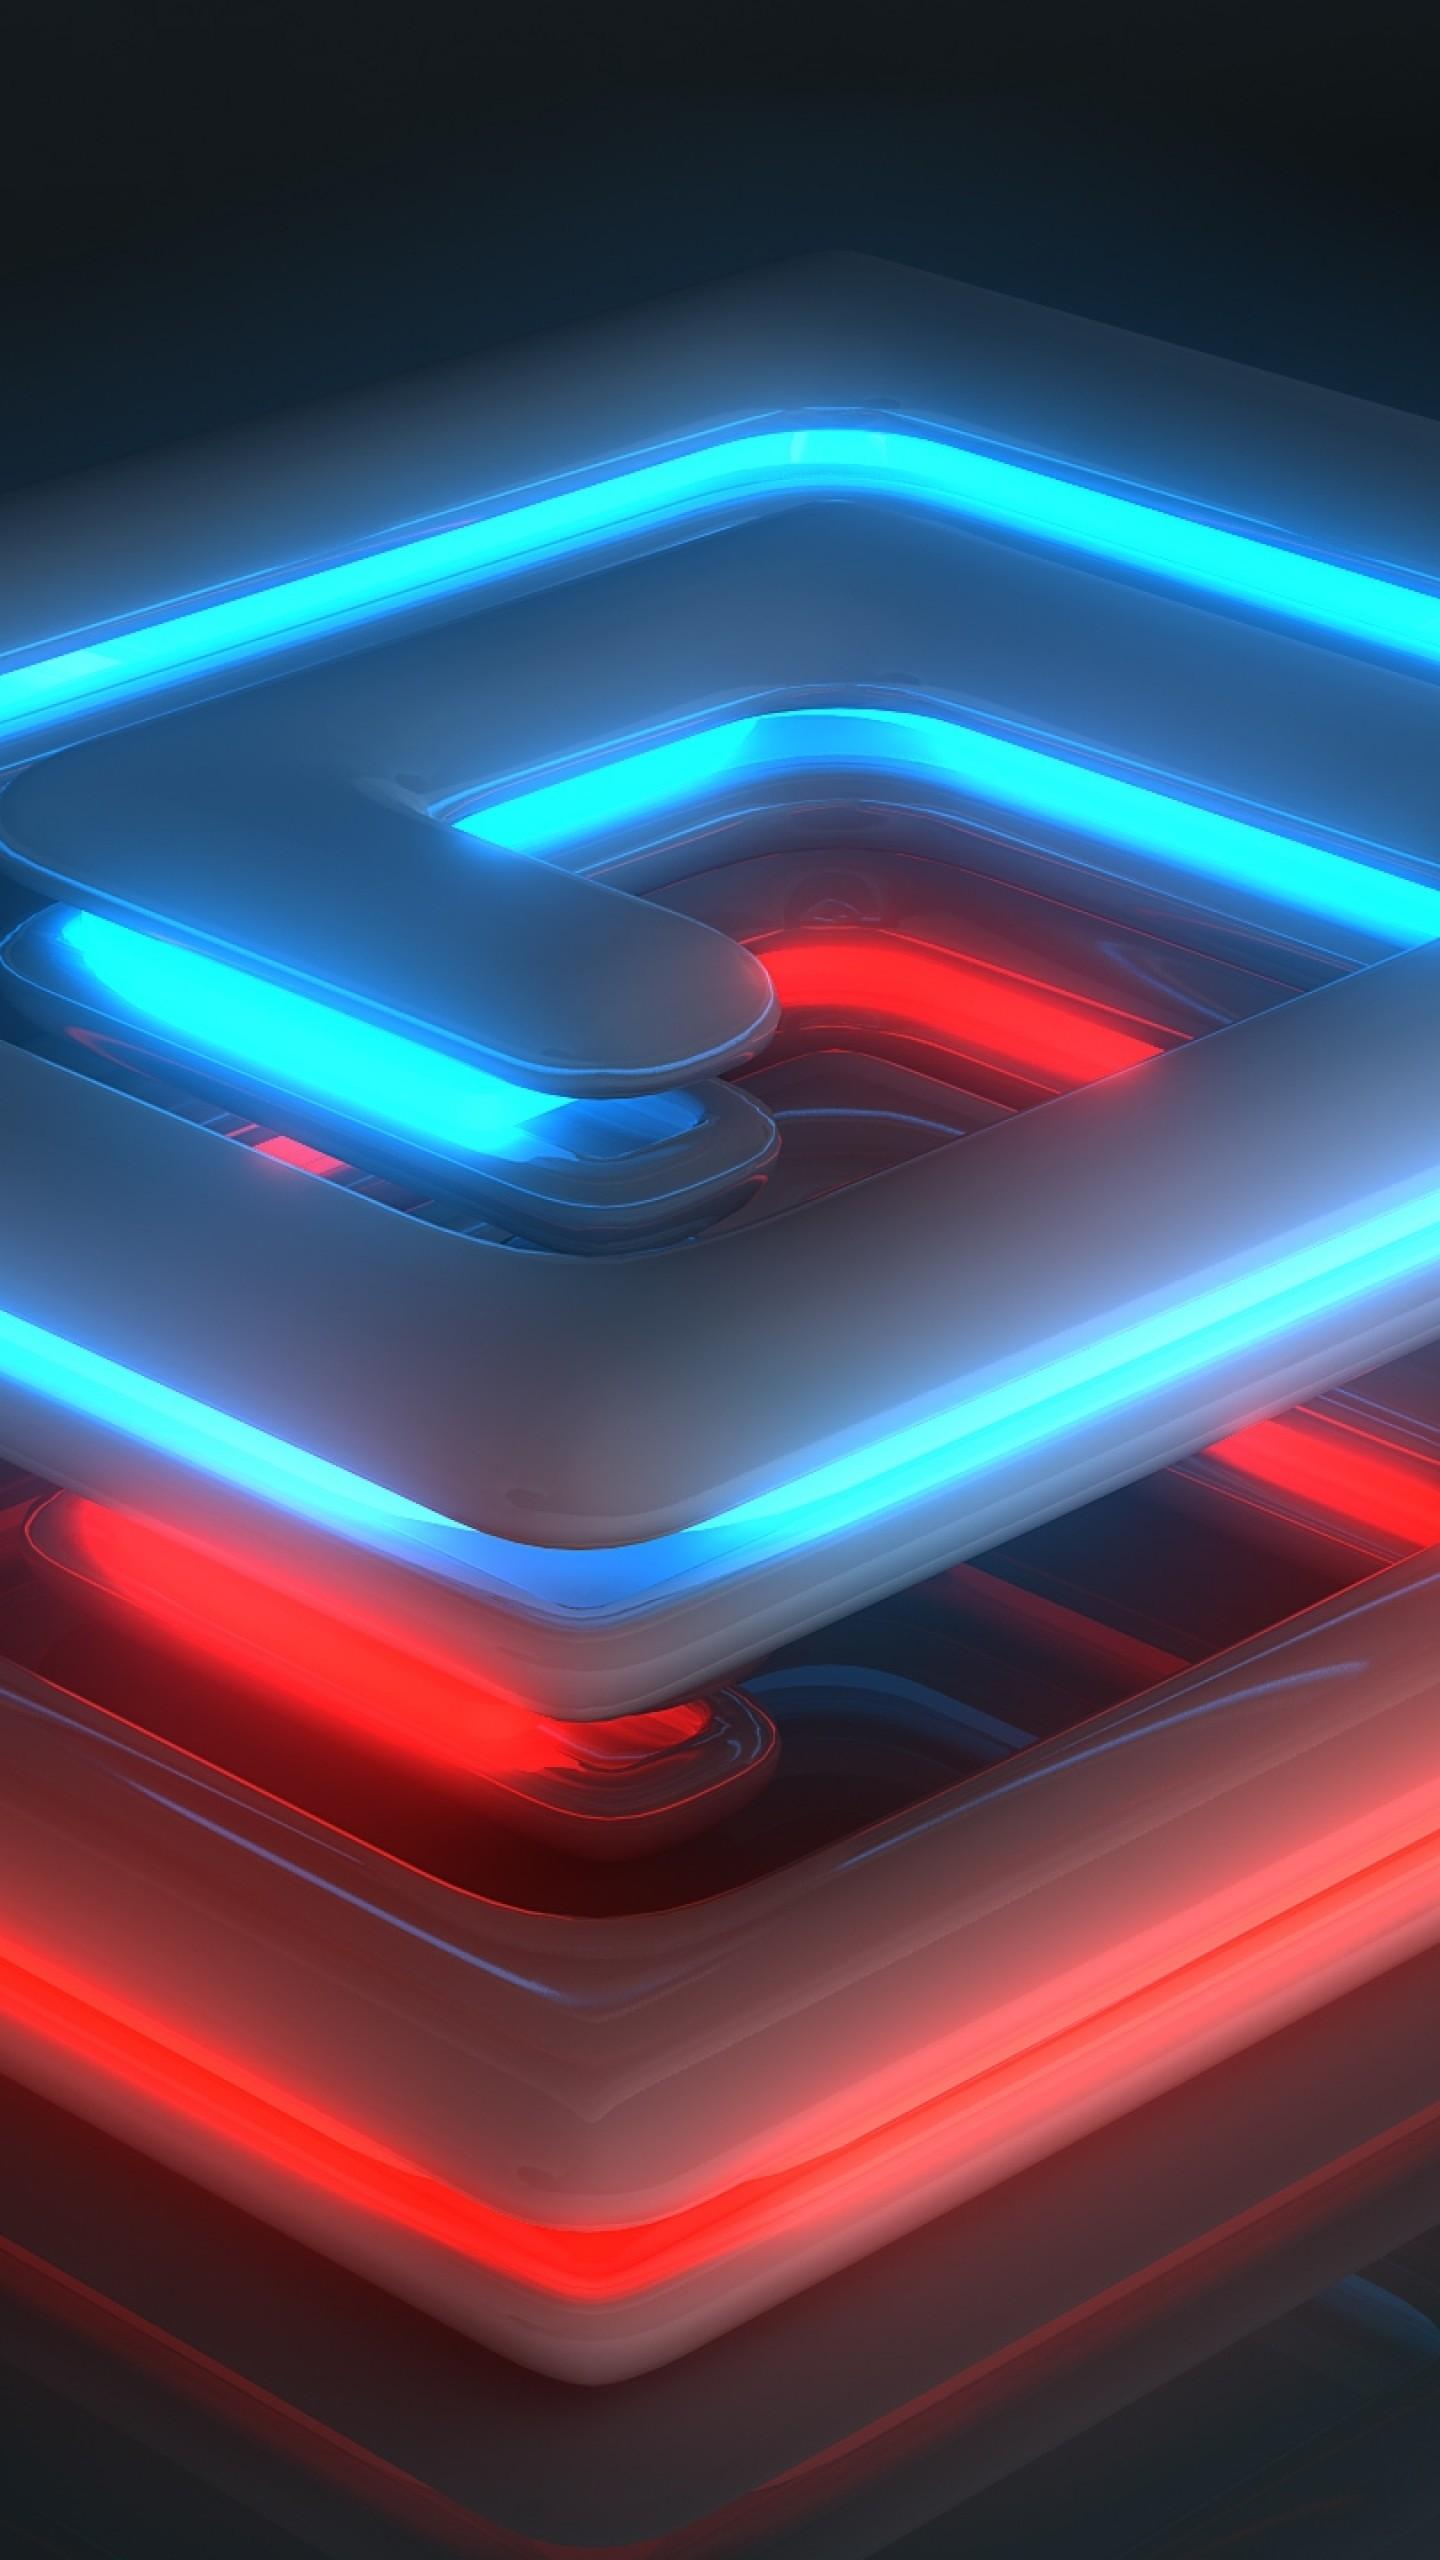 Preview wallpaper neon, light, spiral, shape, surface, luster 1440×2560